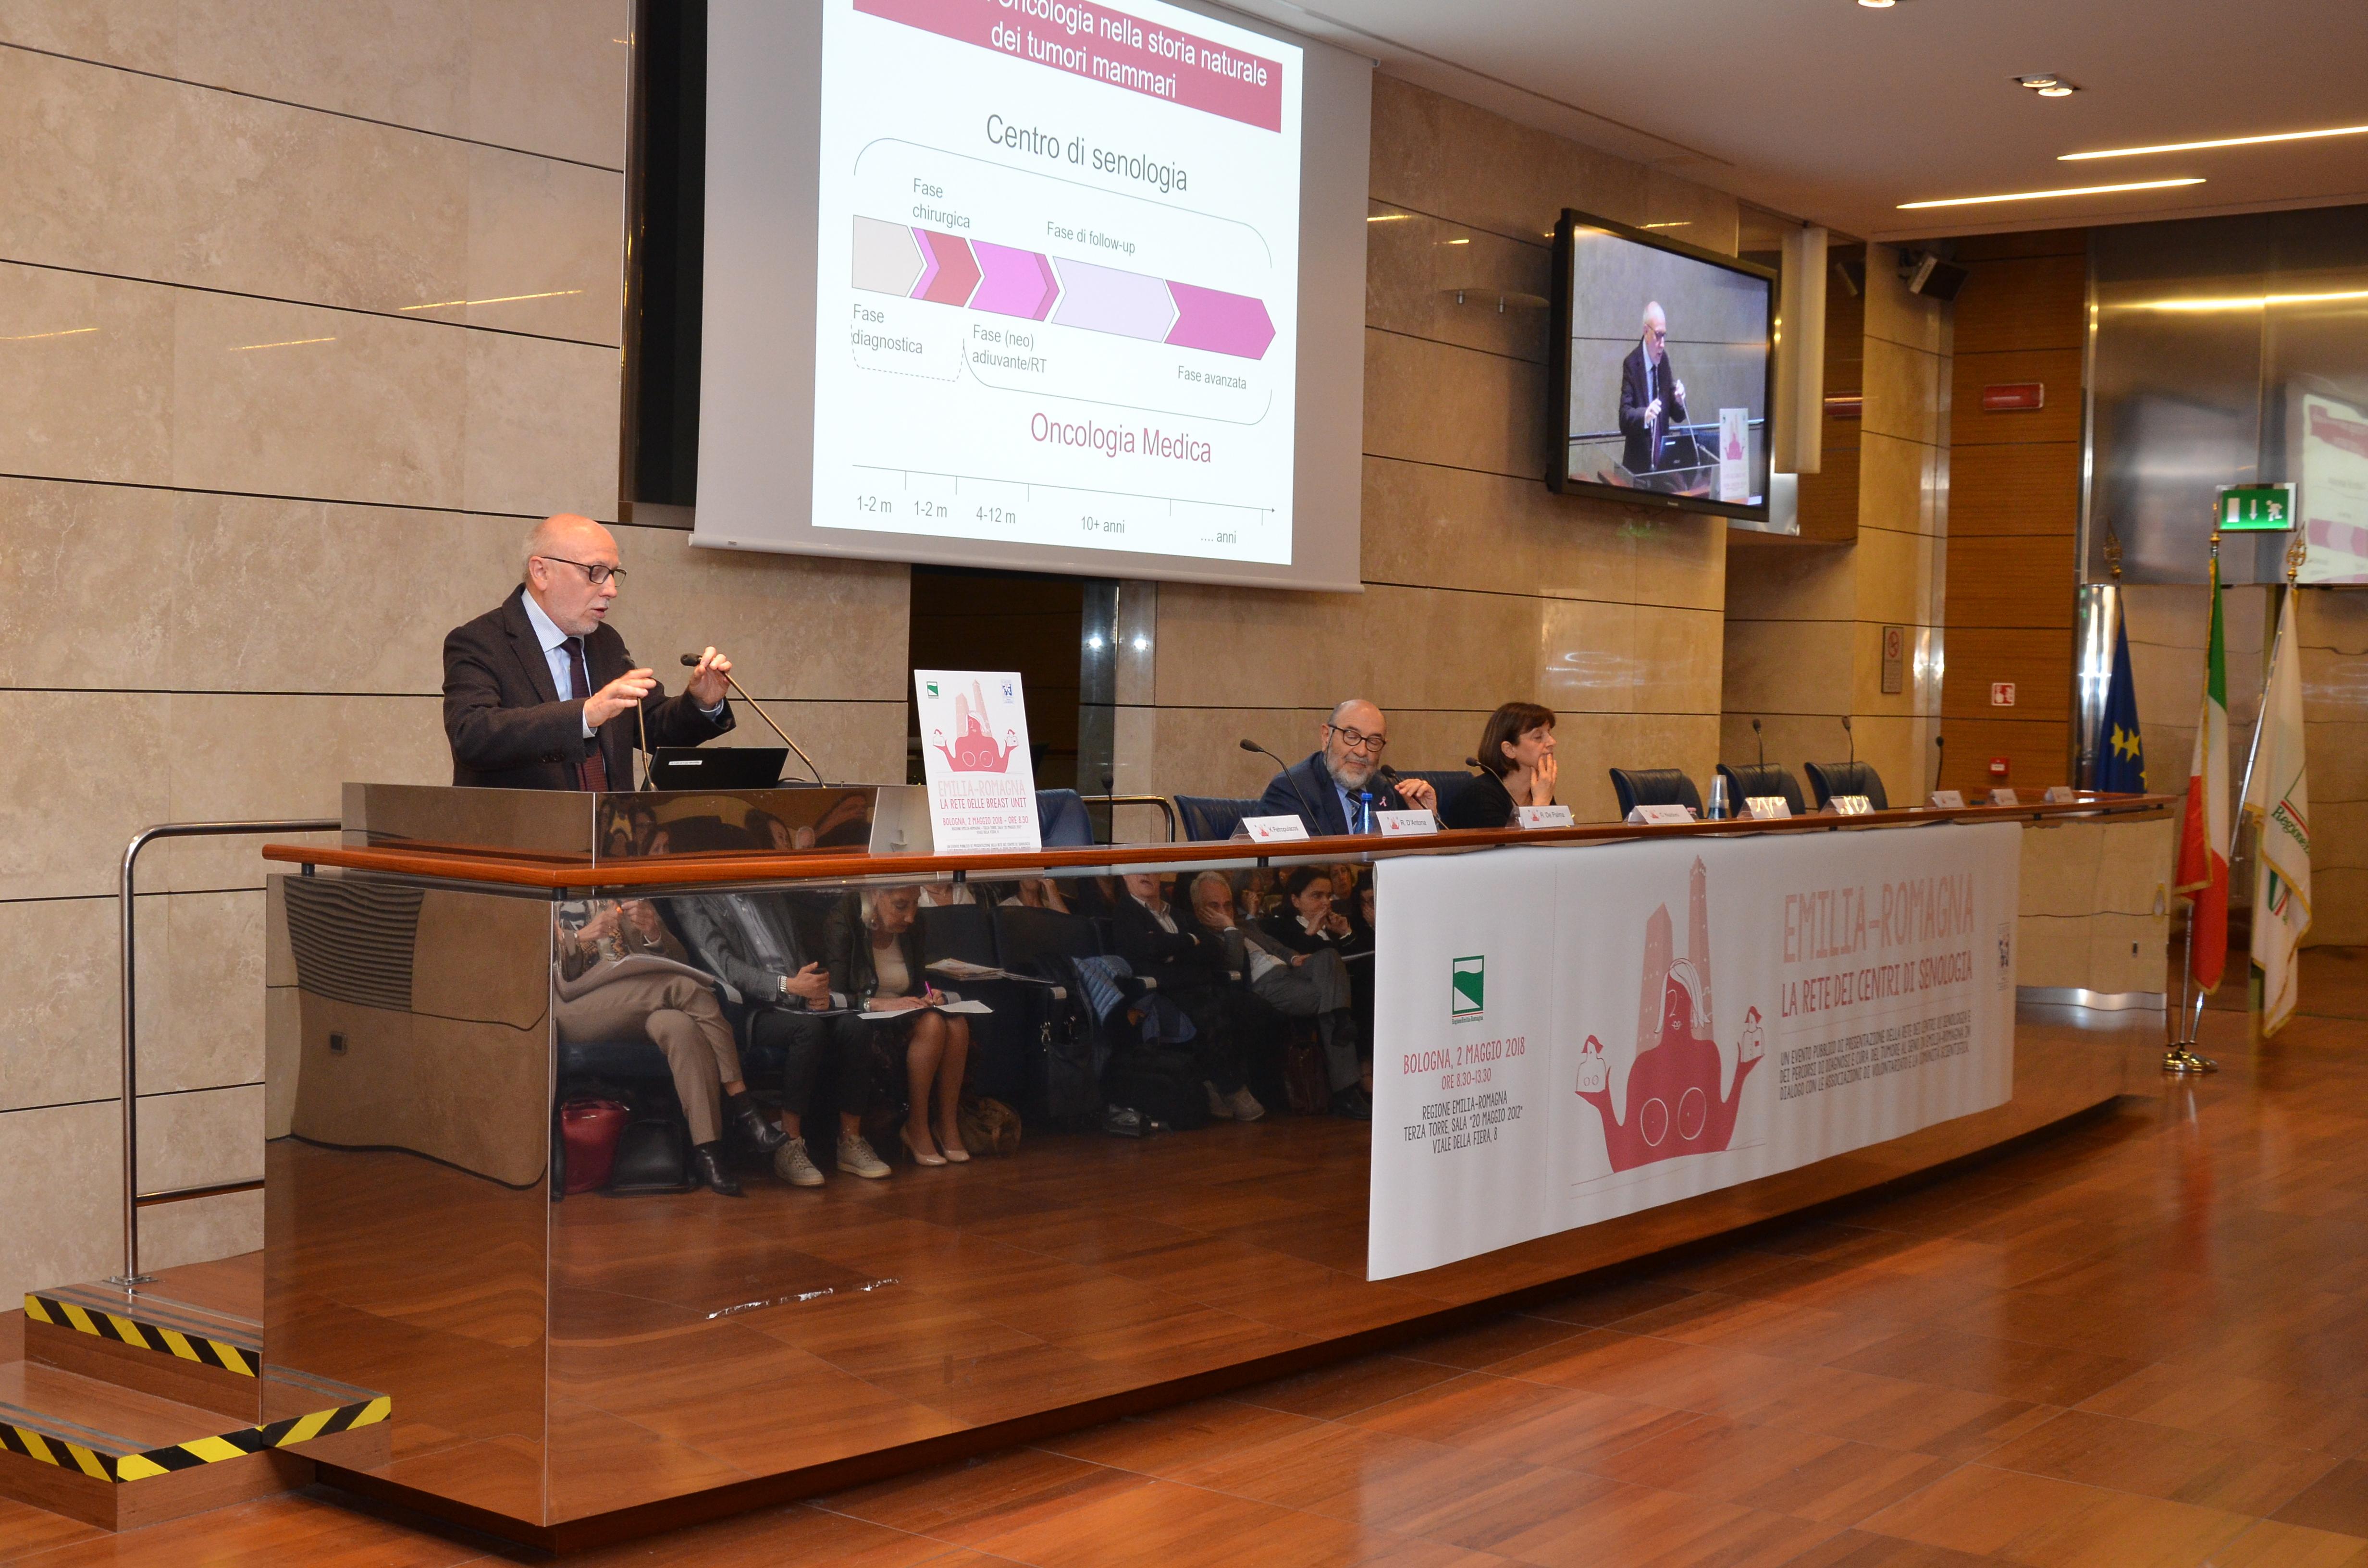 europa-donna-italia-tumore-al-seno-emilia-romagna-frassoldati